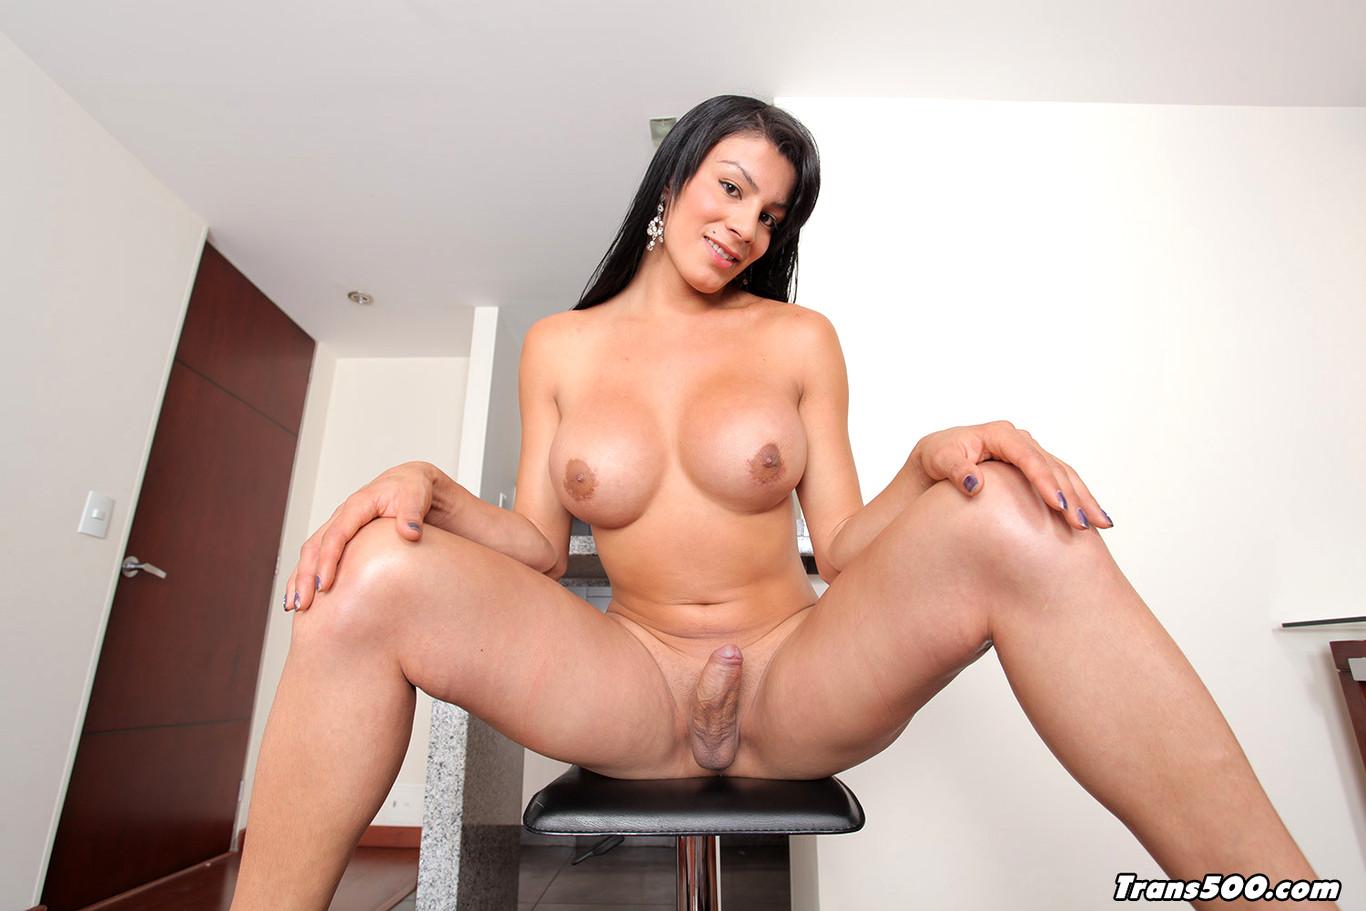 Beautiful trans nude